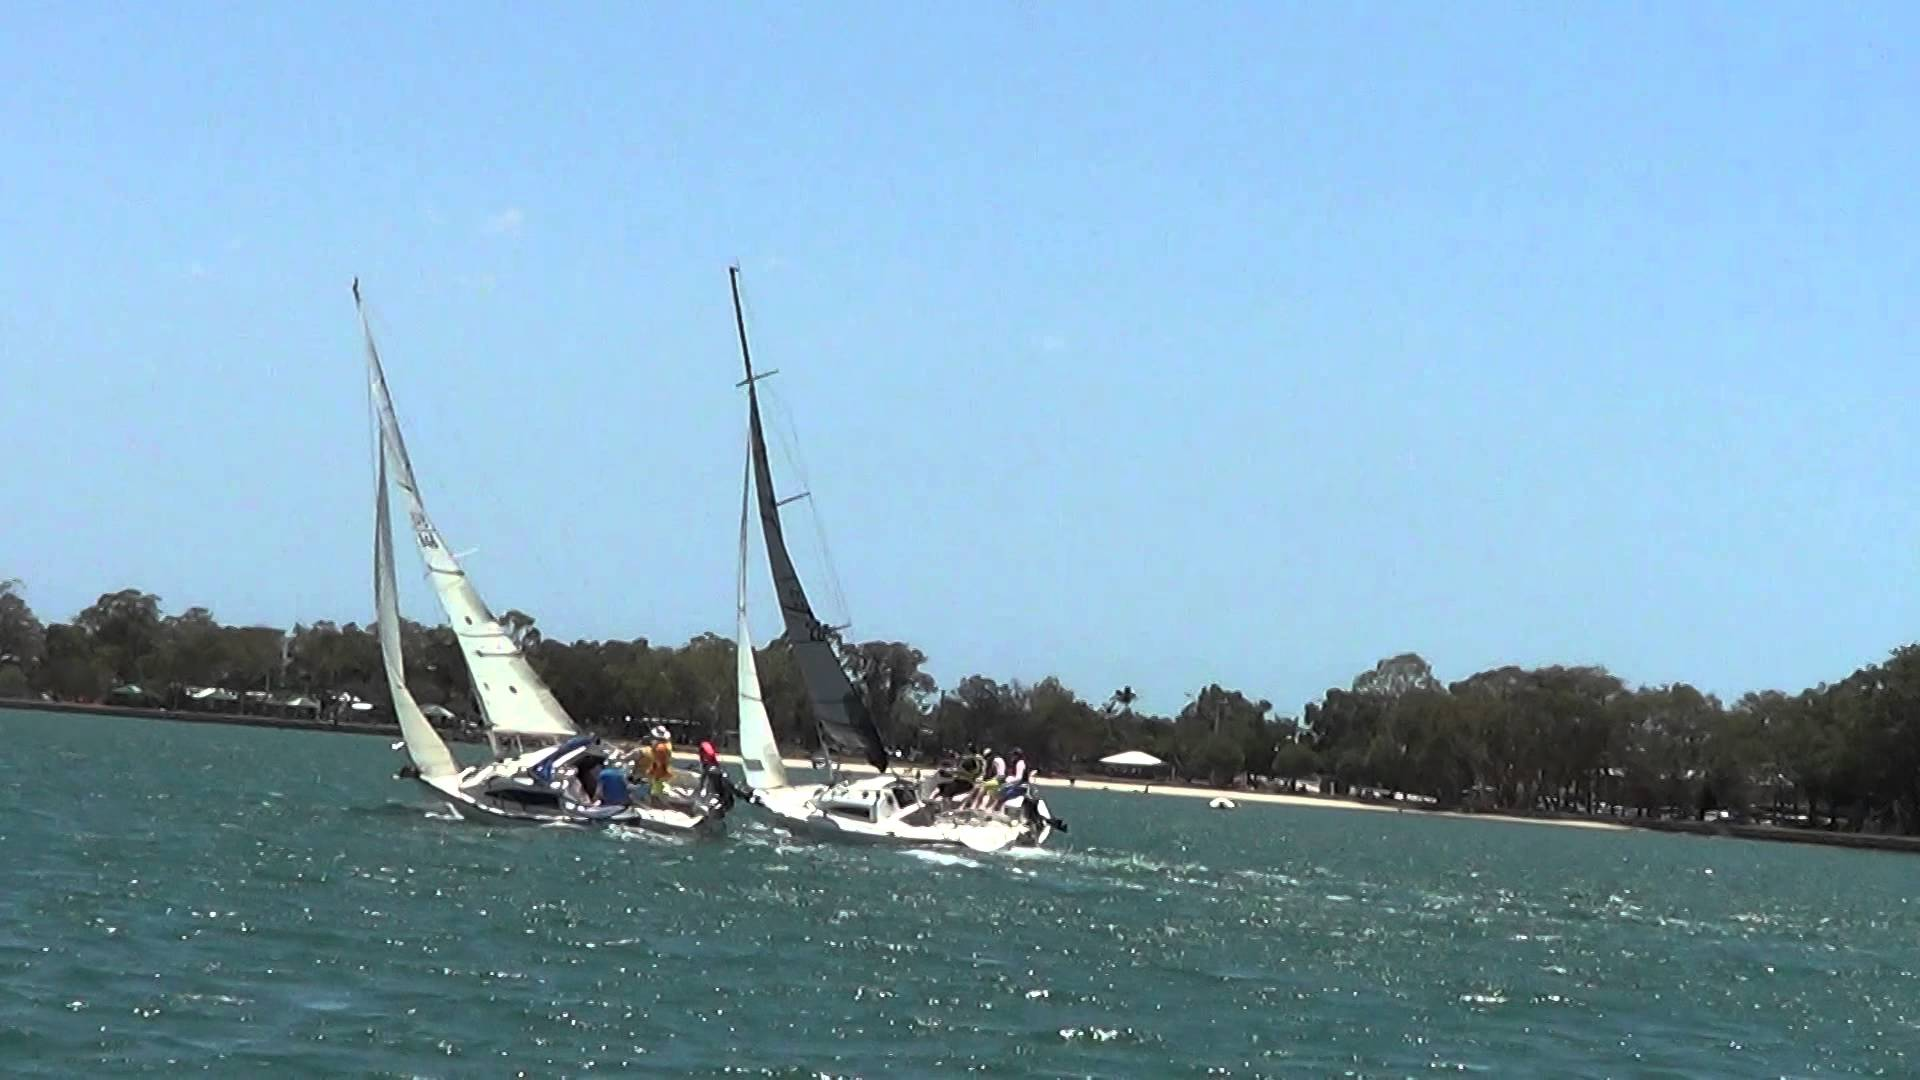 Bribie island yachts